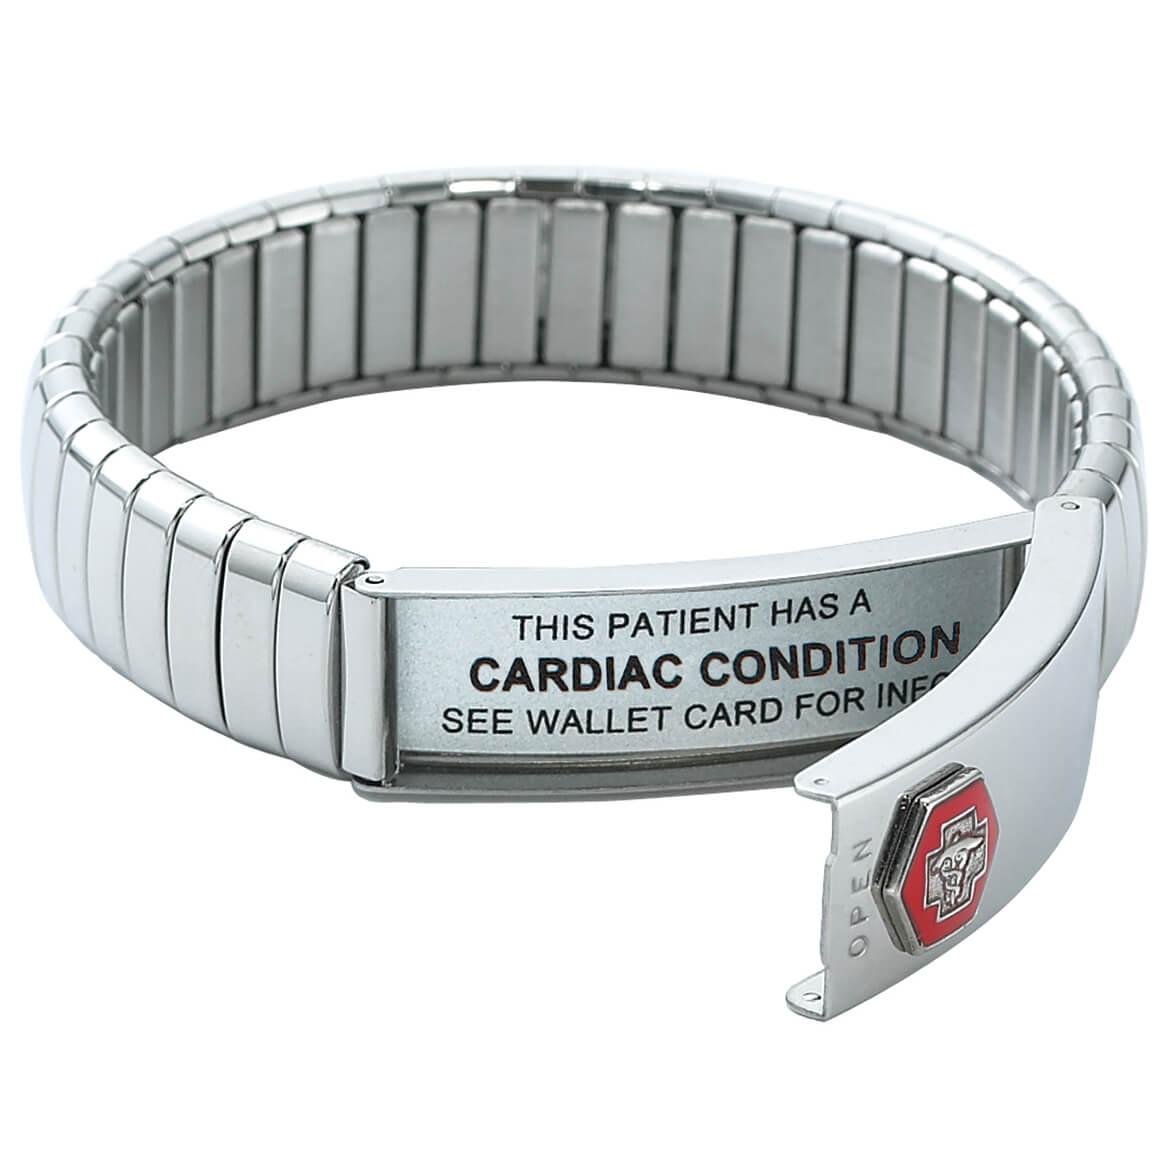 First Aid Alert Bracelet-369833